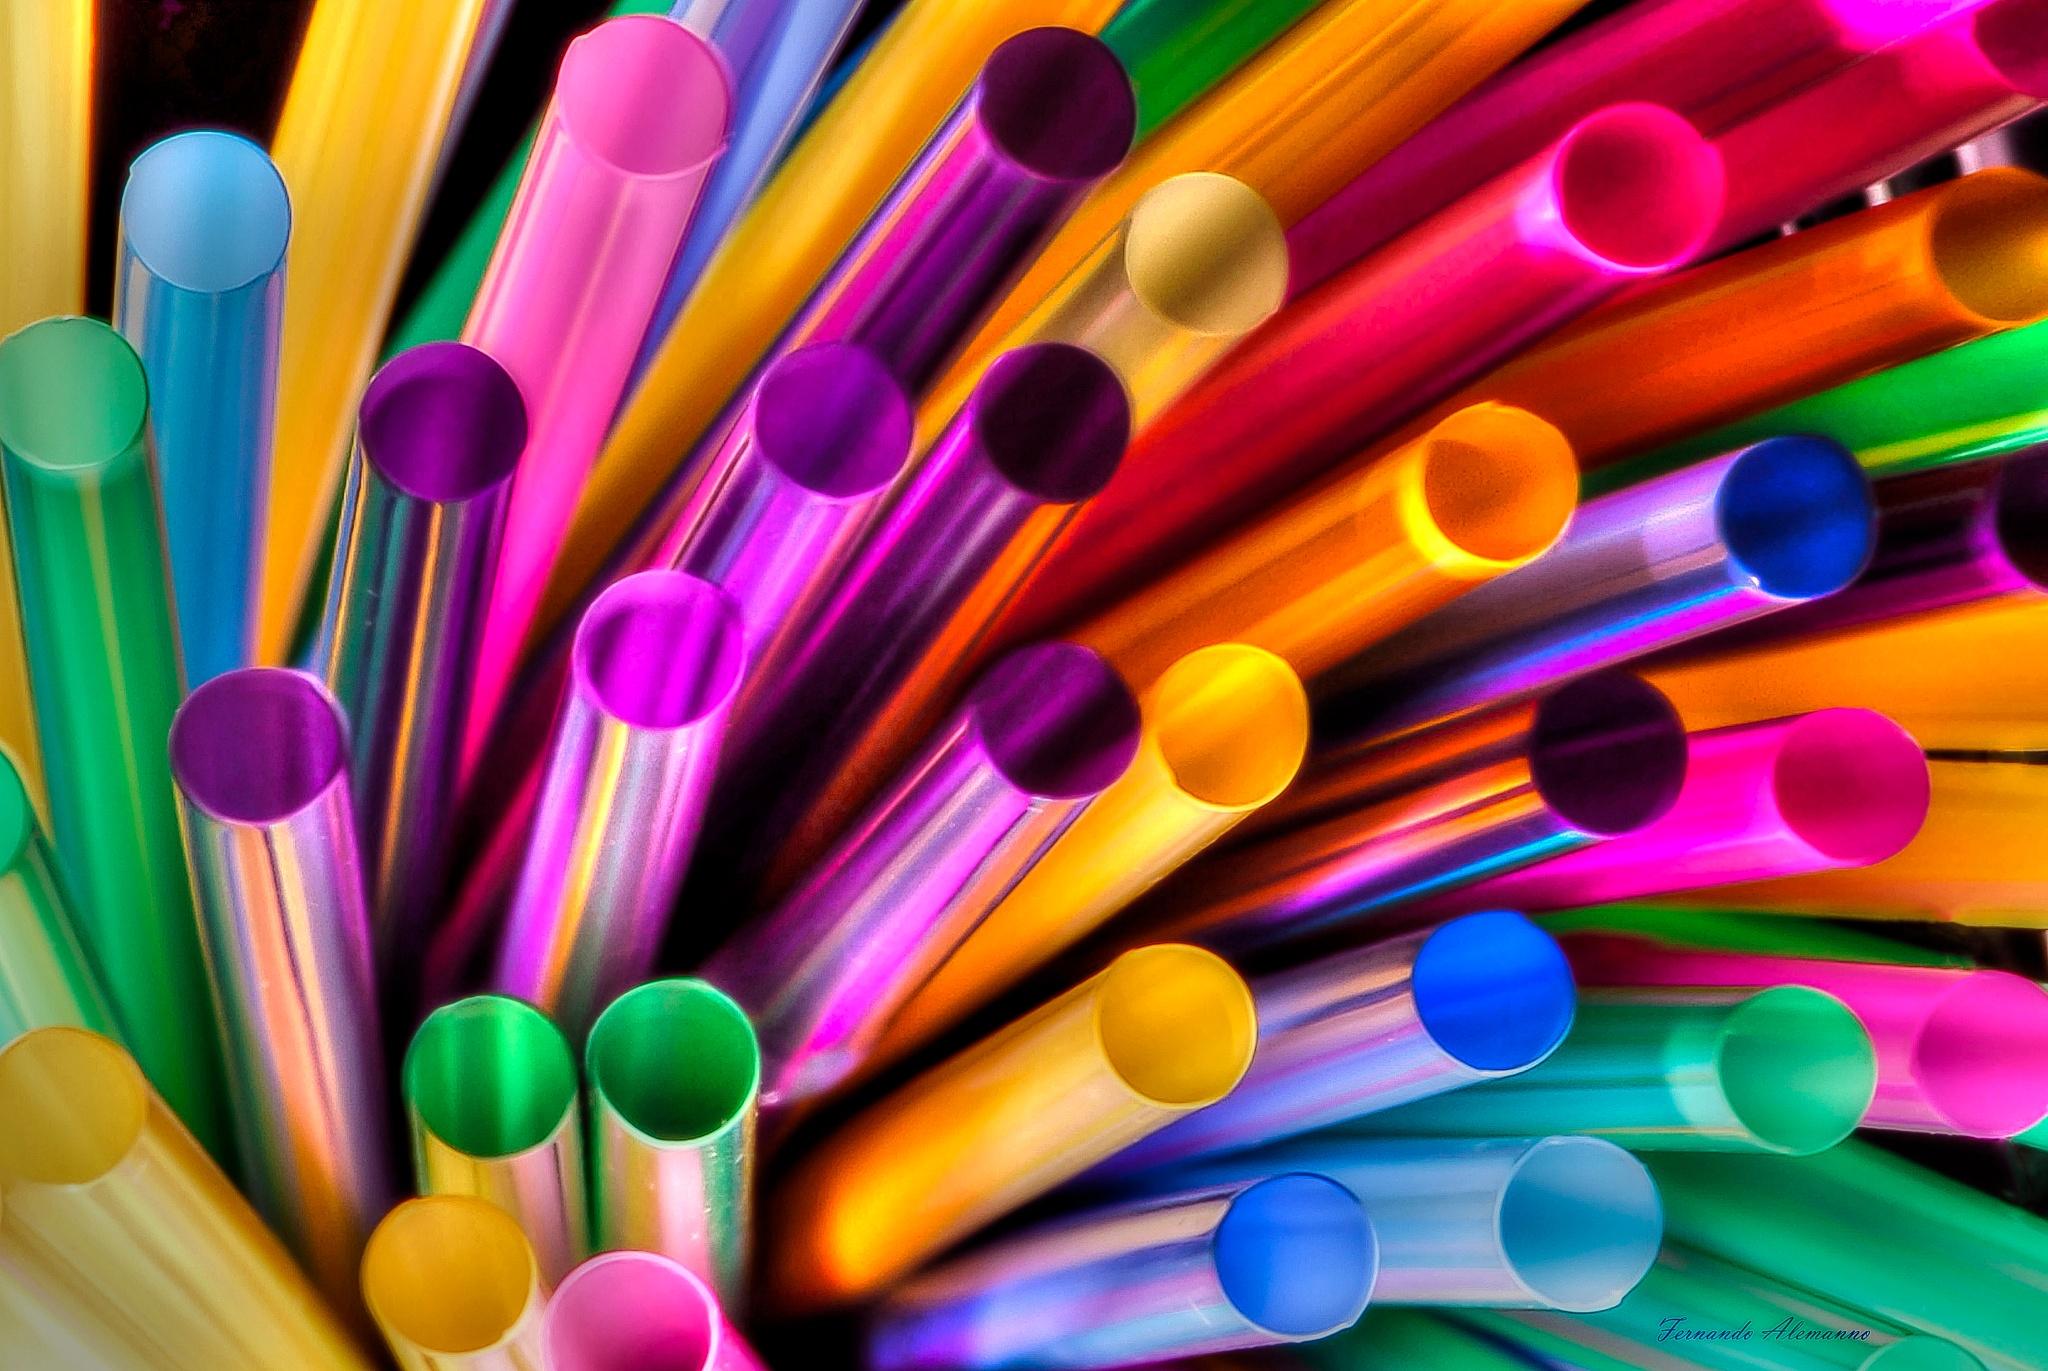 colored straws by fernanduk